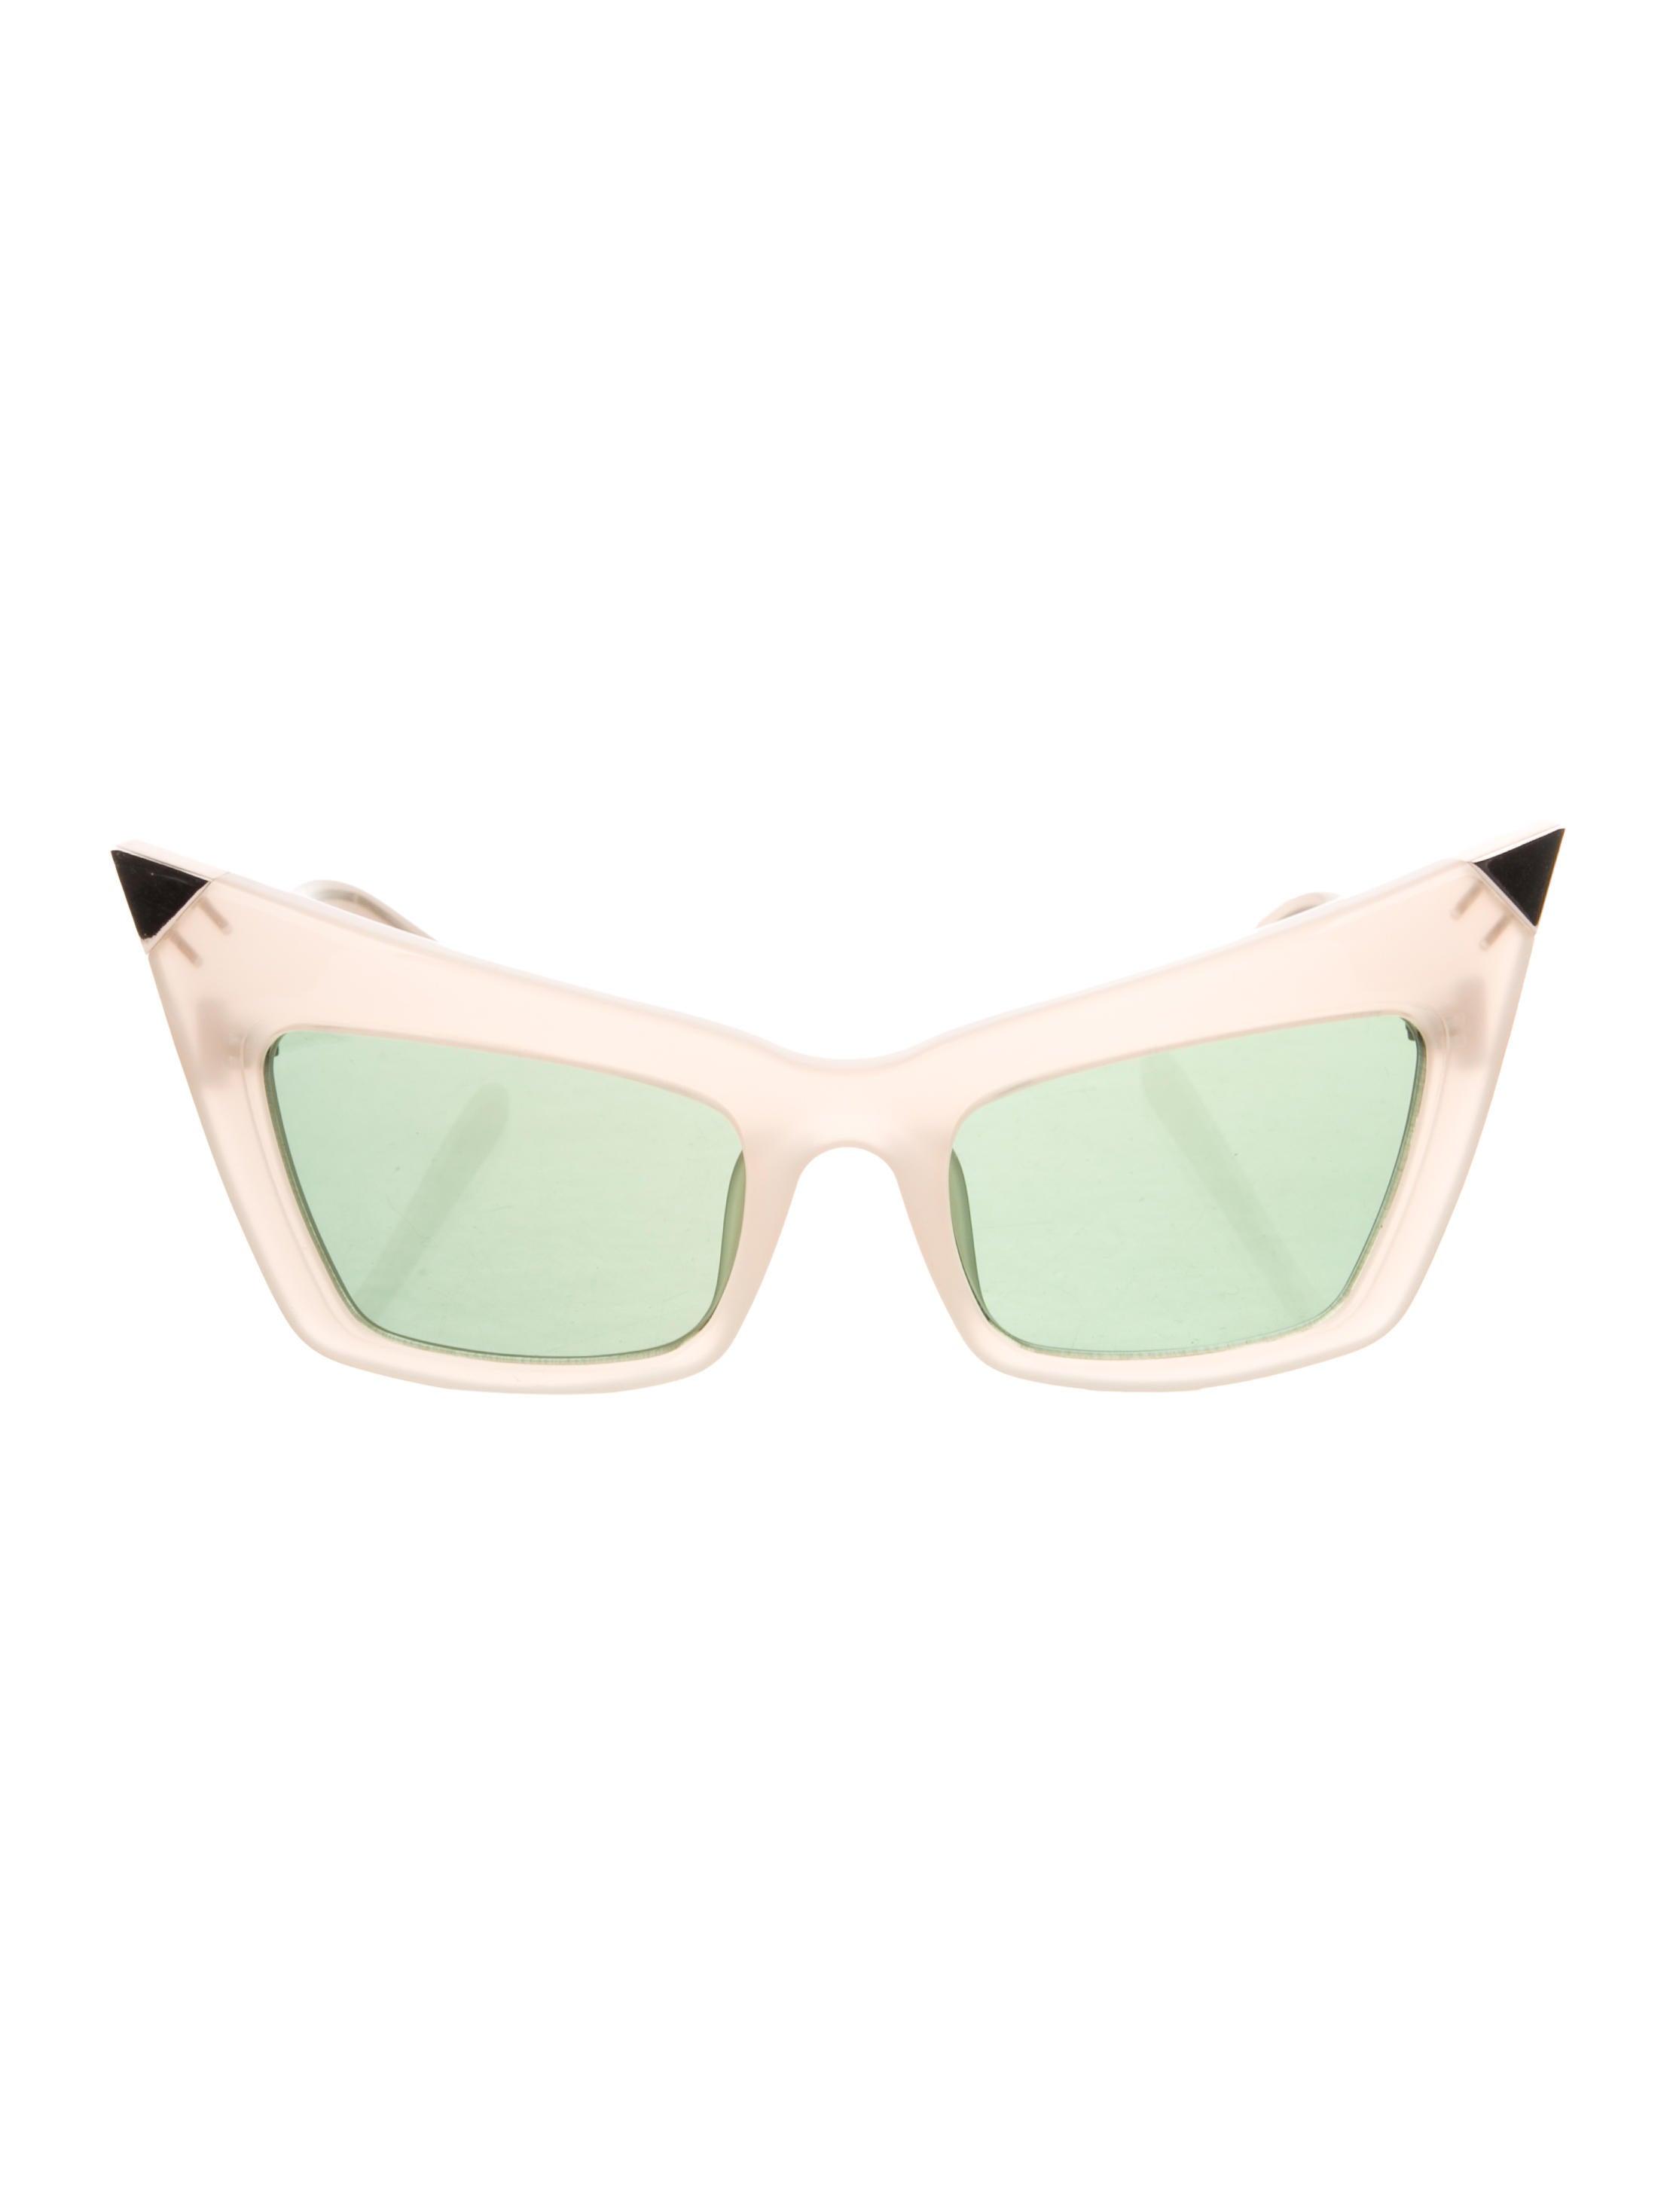 a57396f22bc5 Alexander Wang x Linda Farrow Pointed Cat-Eye Sunglasses w  Tags ...